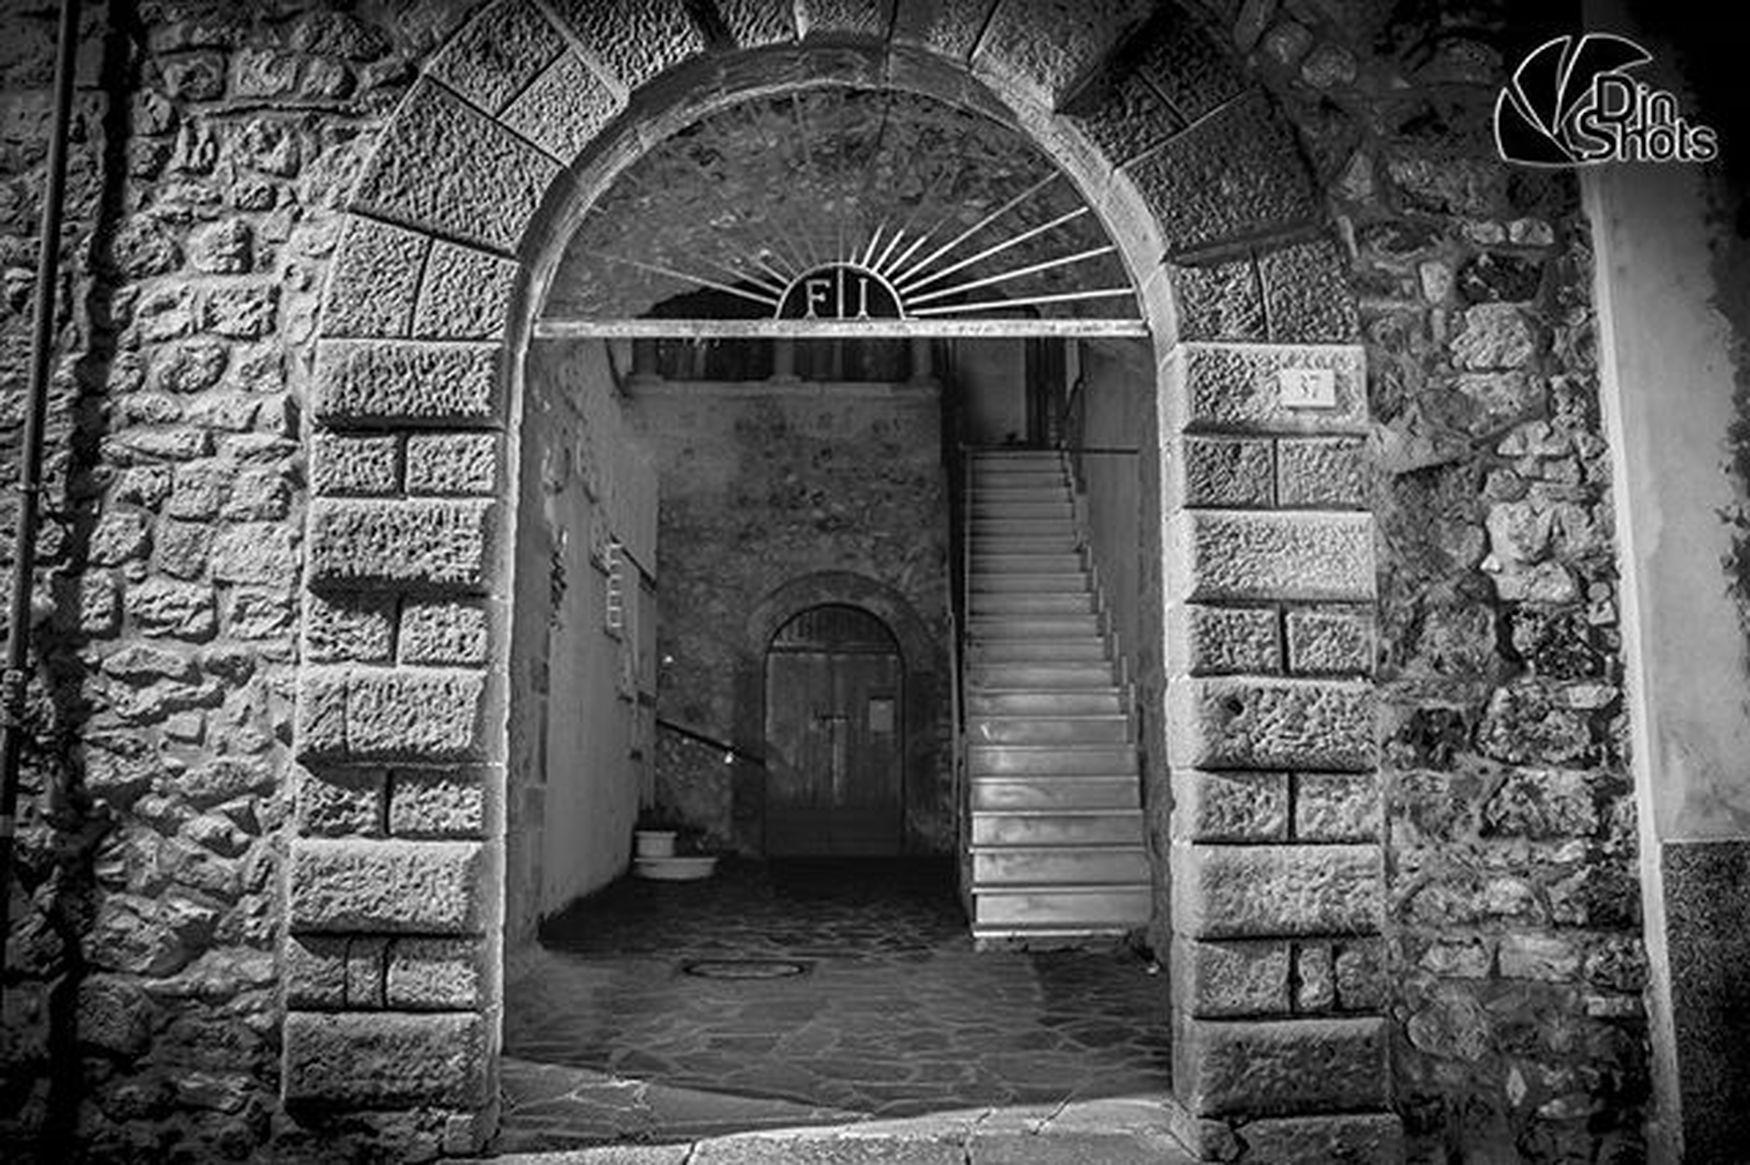 Djnshots Photo Photographer Photography Ph Canon Canon_photos Reflex Photooftheday Picoftheday Instaphoto Instapic Streetphotography Rapolla Basilicata Lucania Italy Bw Bw_photooftheday Bw_lover Door Old HDR